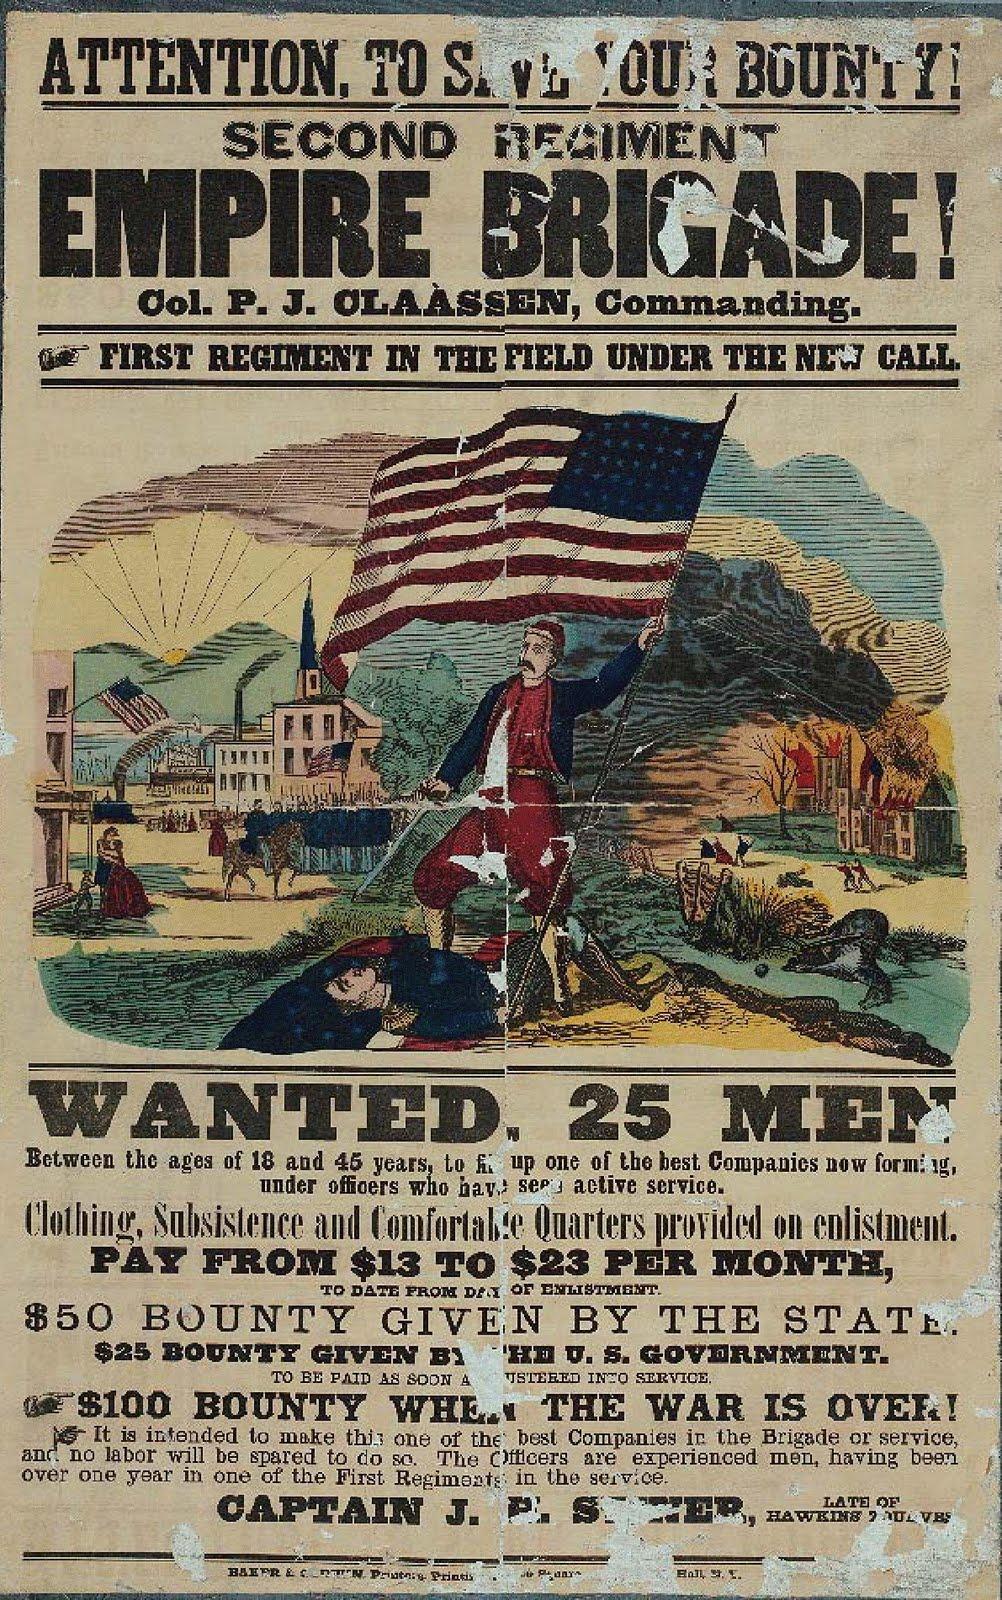 Vintage World War II posters